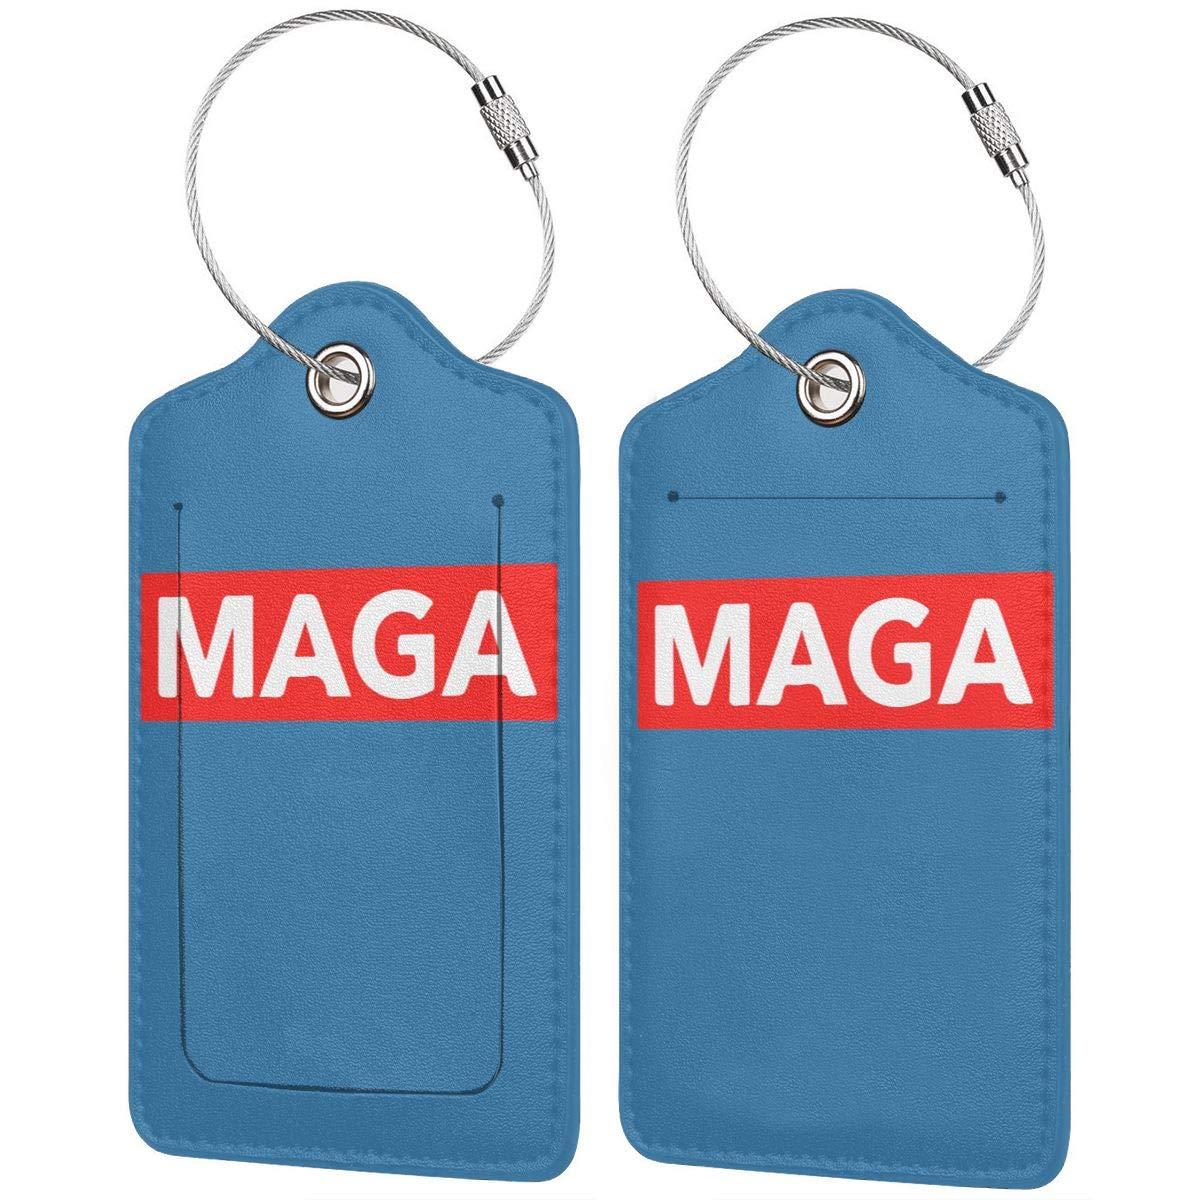 1pcs,2pcs,4pcs Make America Great Again Pu Leather Double Sides Print Luggage Tag Mutilple Packs